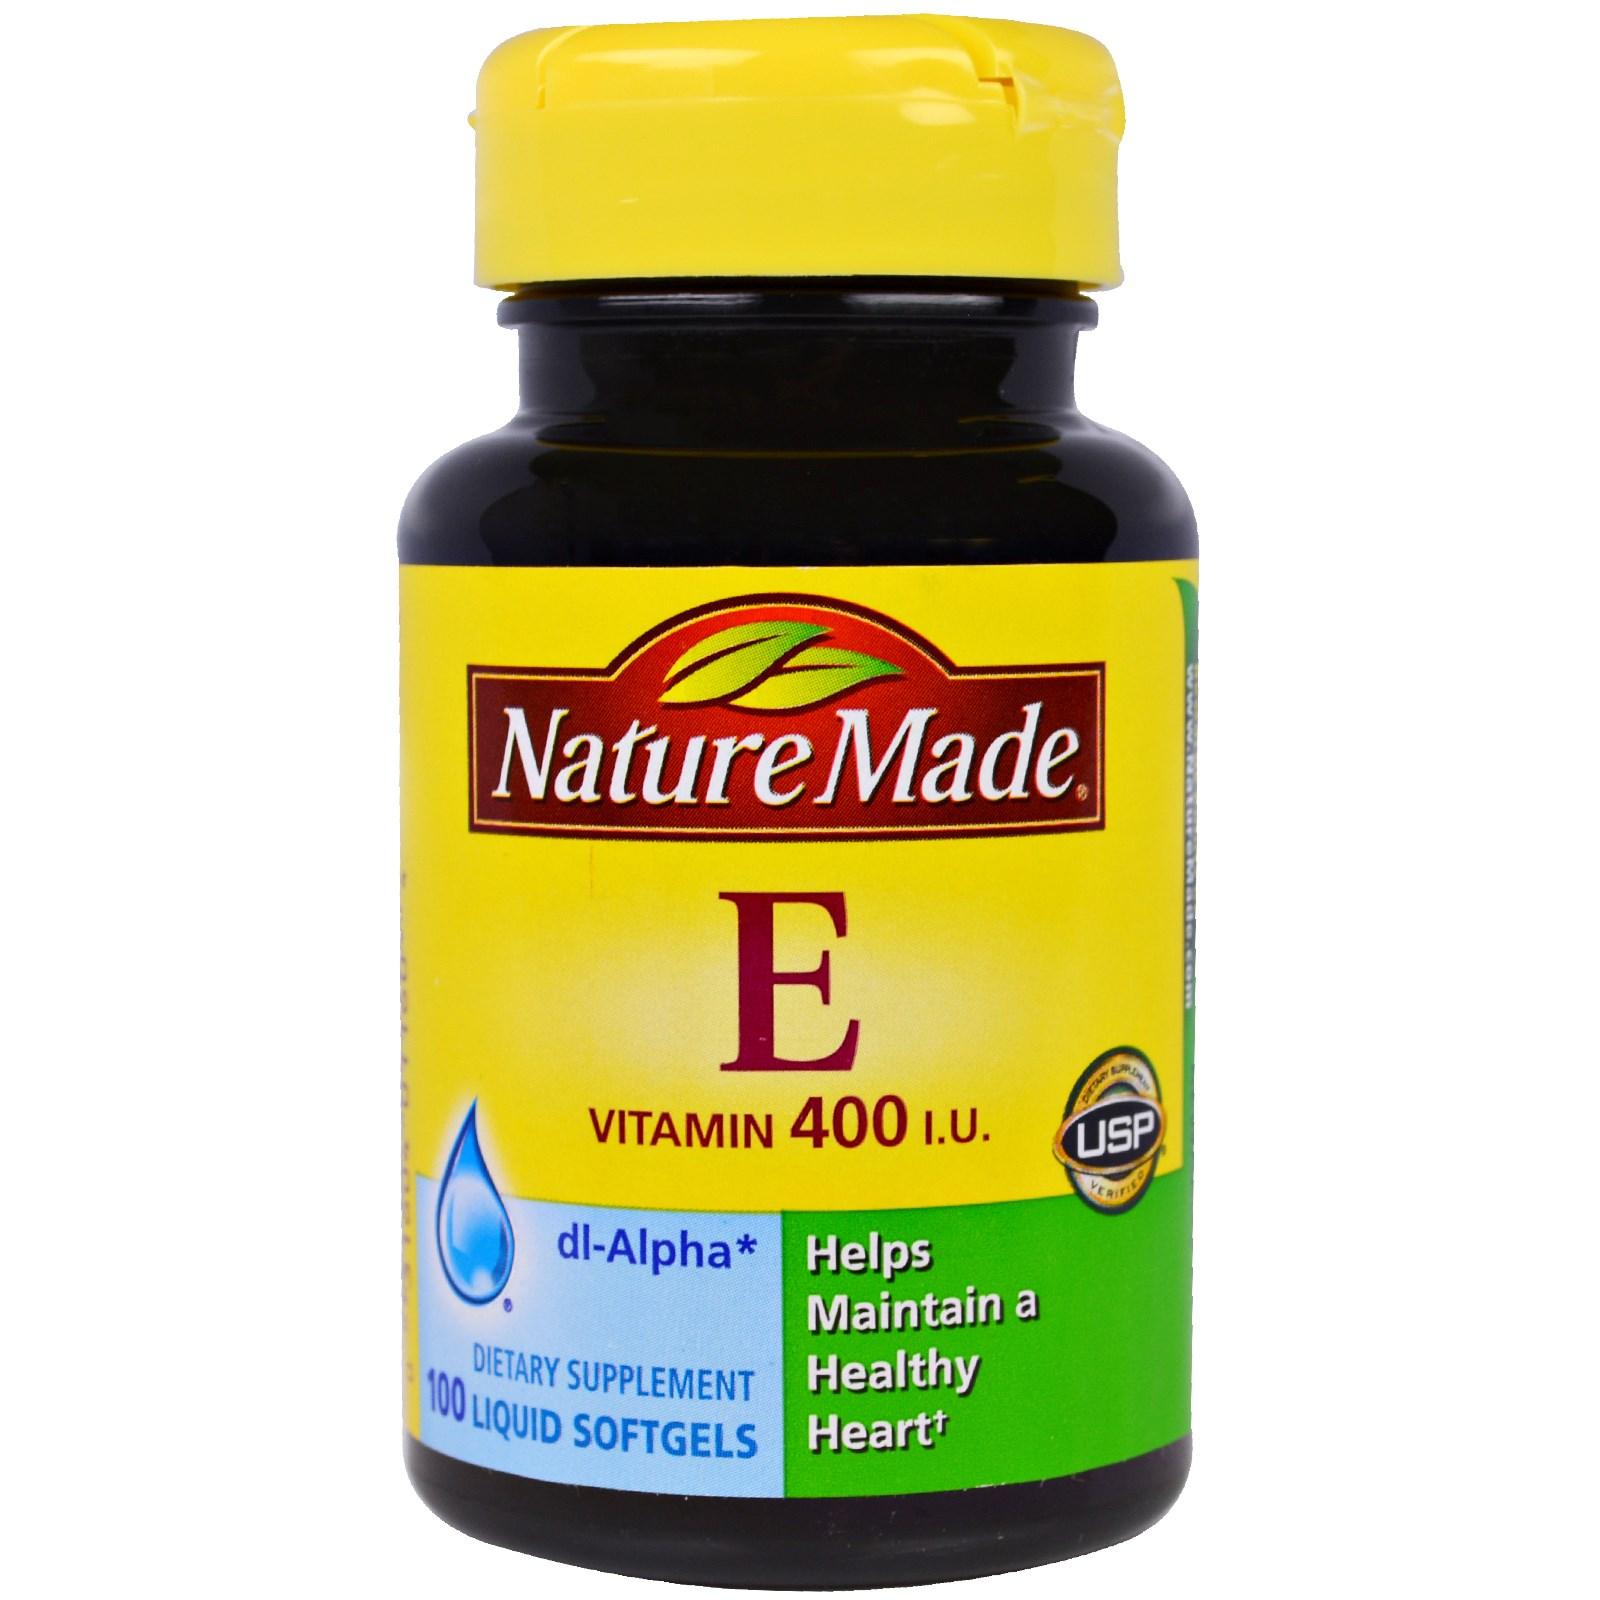 Vitamin E, 400 IU, 100 viên nang mềm, hiệu Nature Made